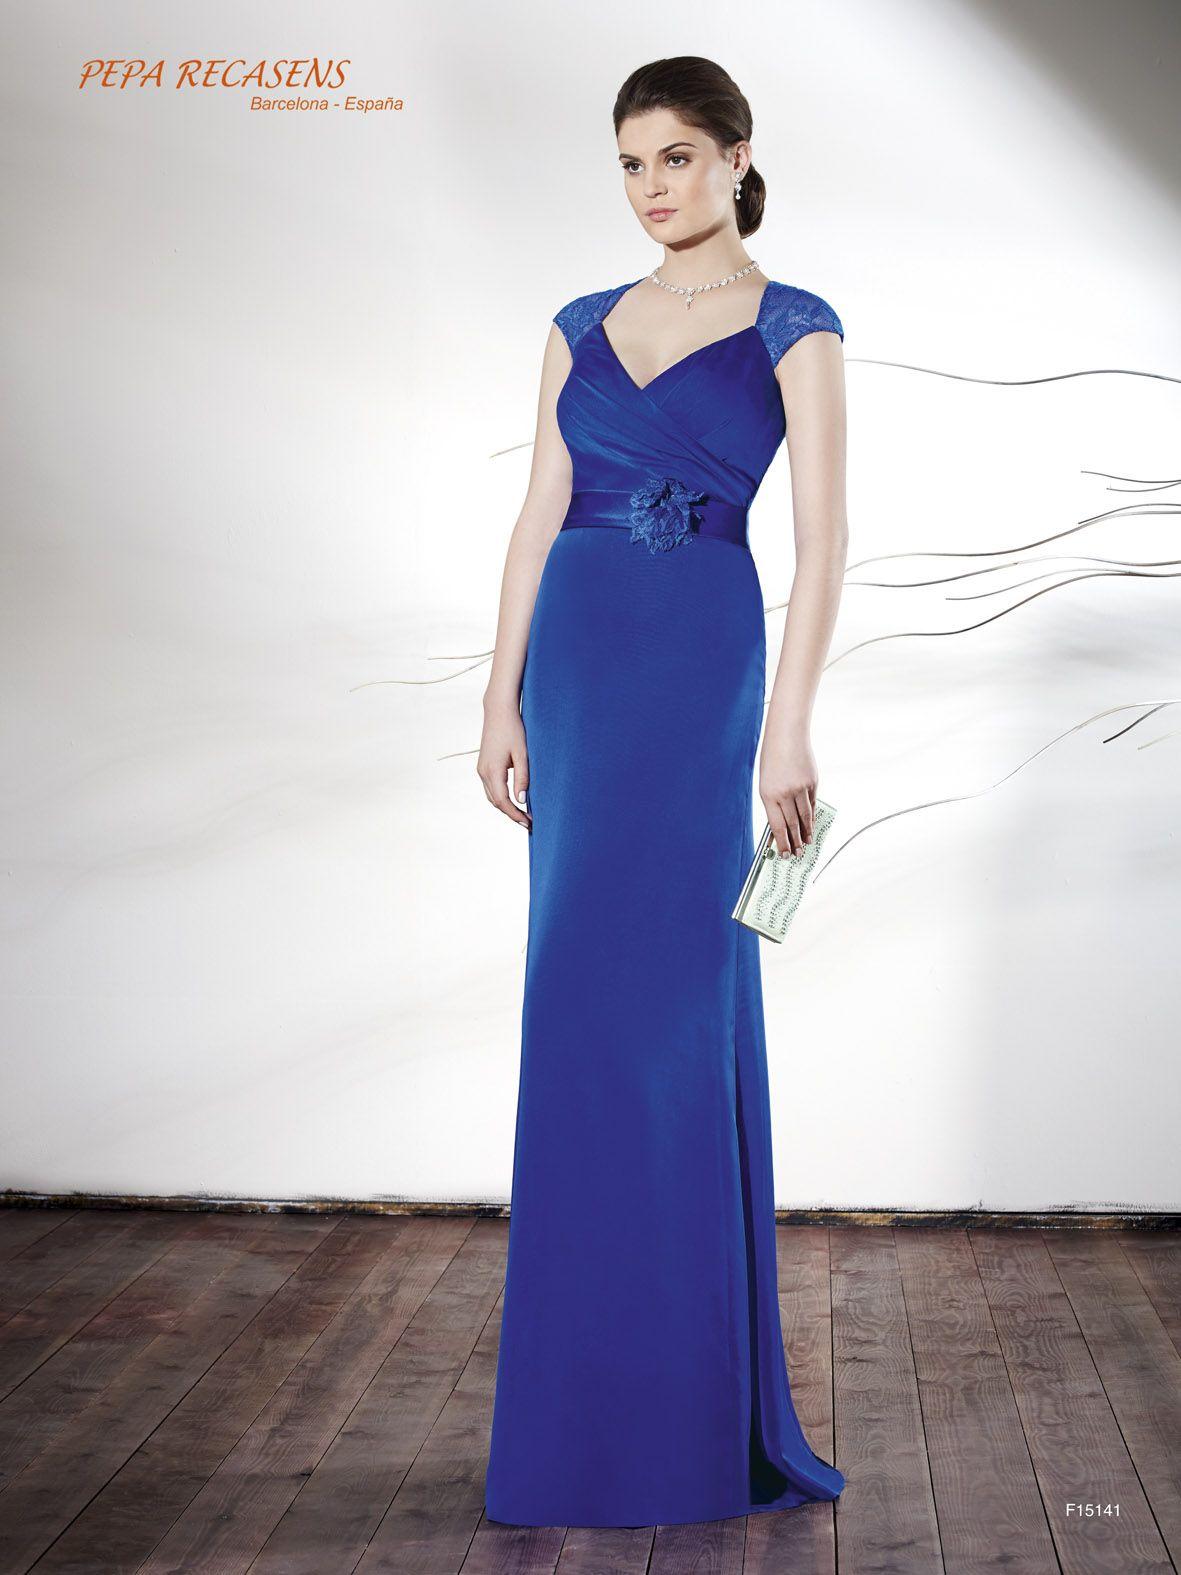 Vestido de fiesta Pepa Recasens modelo F15141